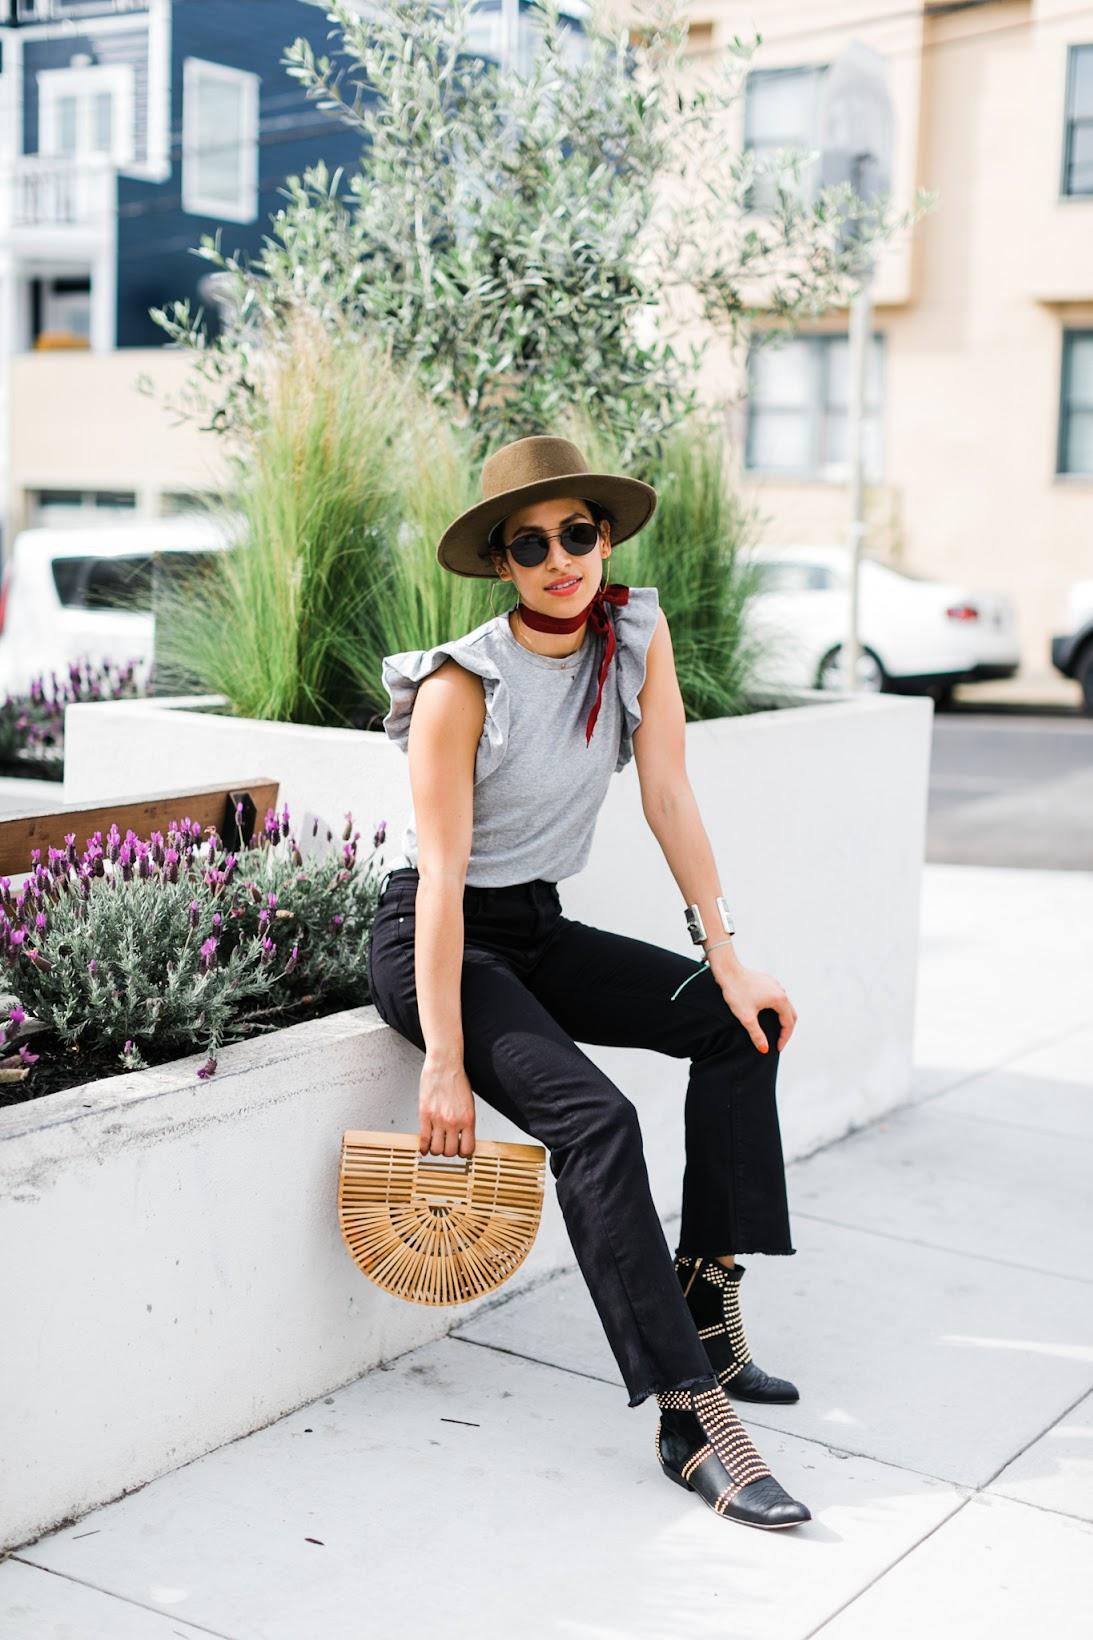 most photogenic street in San Francisco, coolest neighborhood in San Francisco, how to dress for a San Francisco summer, Cult Gaia, Jigsaw denim, ruffle tee shirt, Anine Bing Charlie boots, Goorin Bros. hat